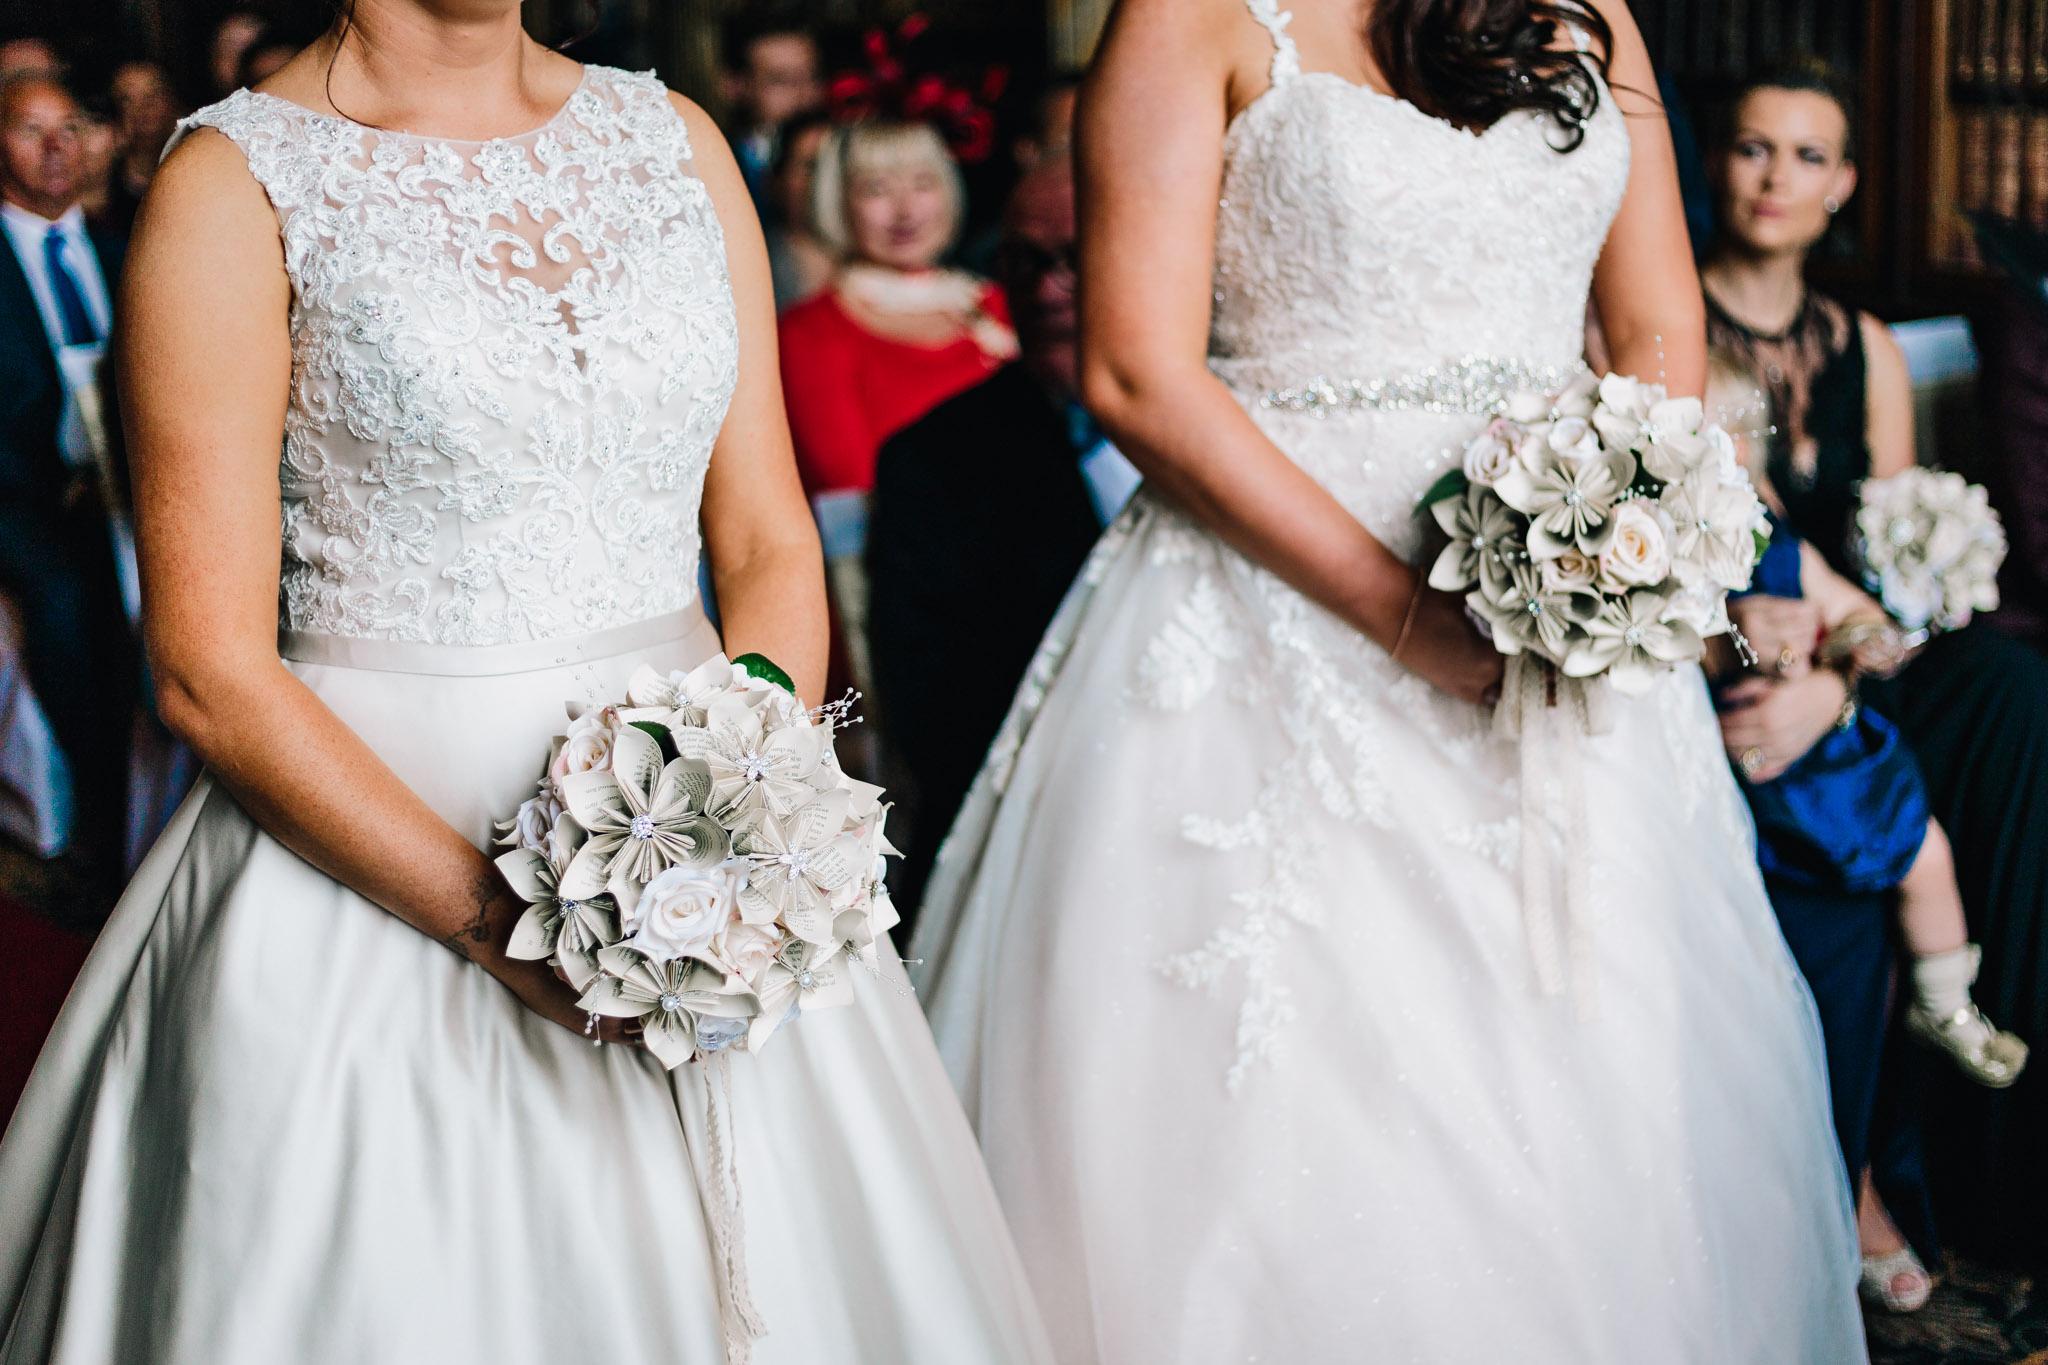 SAME SEX BRIDES HOLDING HARRY POTTER PAPER FLOWERS AT WEDDING